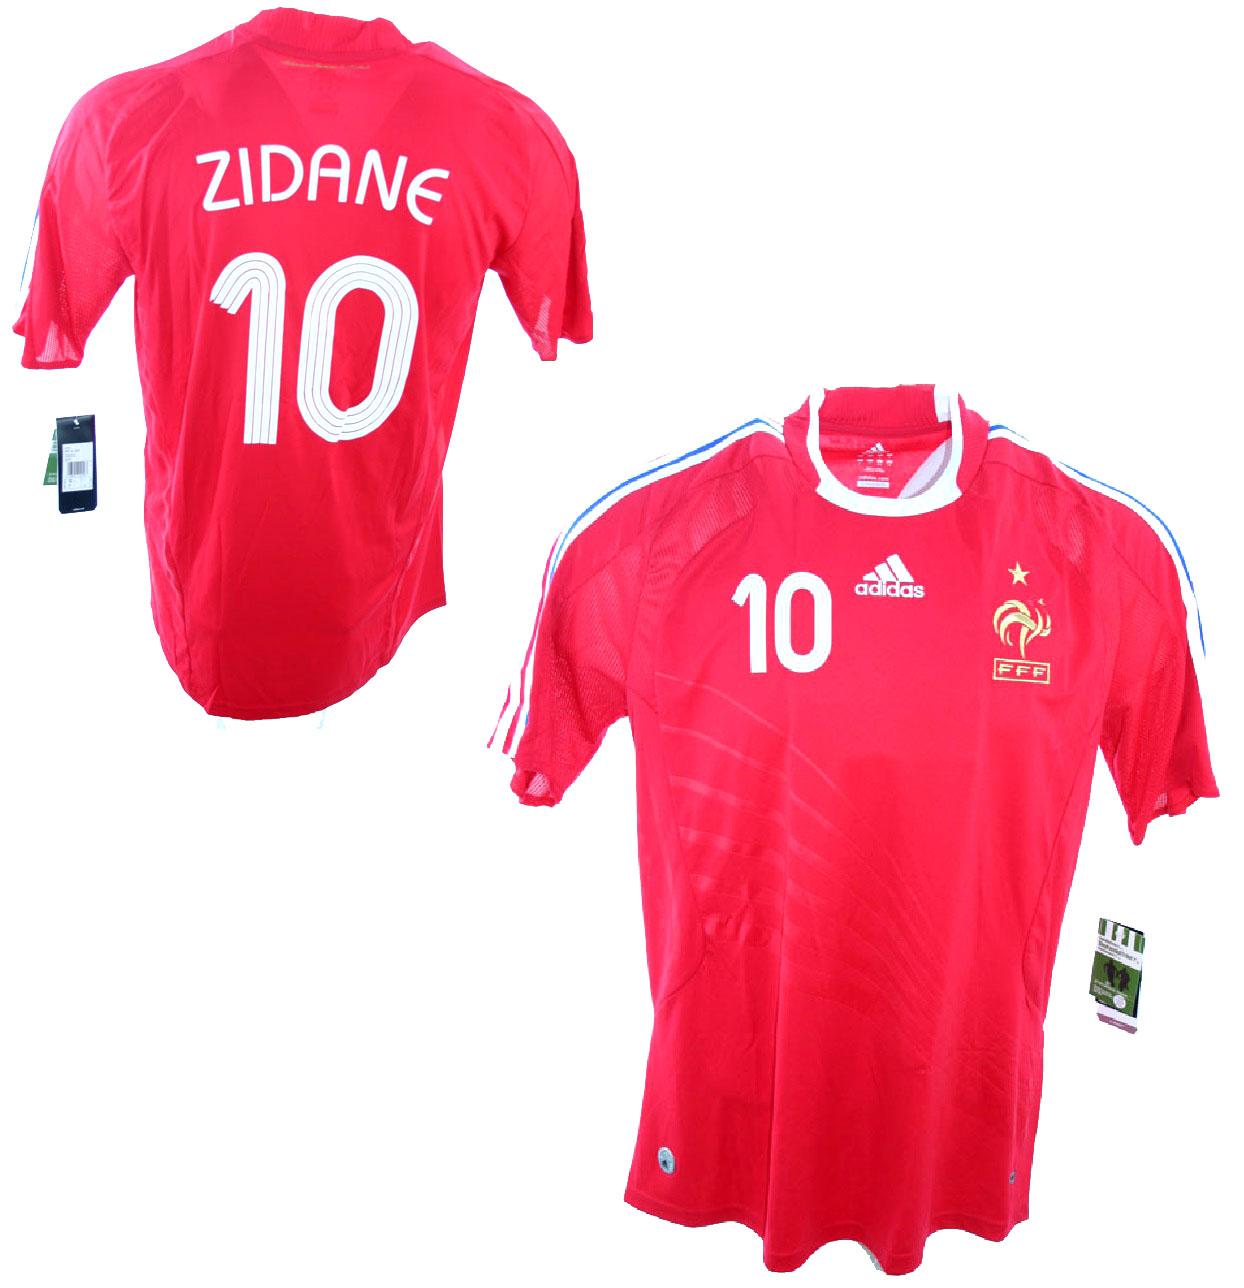 4eea0364a63 Adidas France jersey 10 Zinedine Zidane WC 2006 red new men s XS S M ...